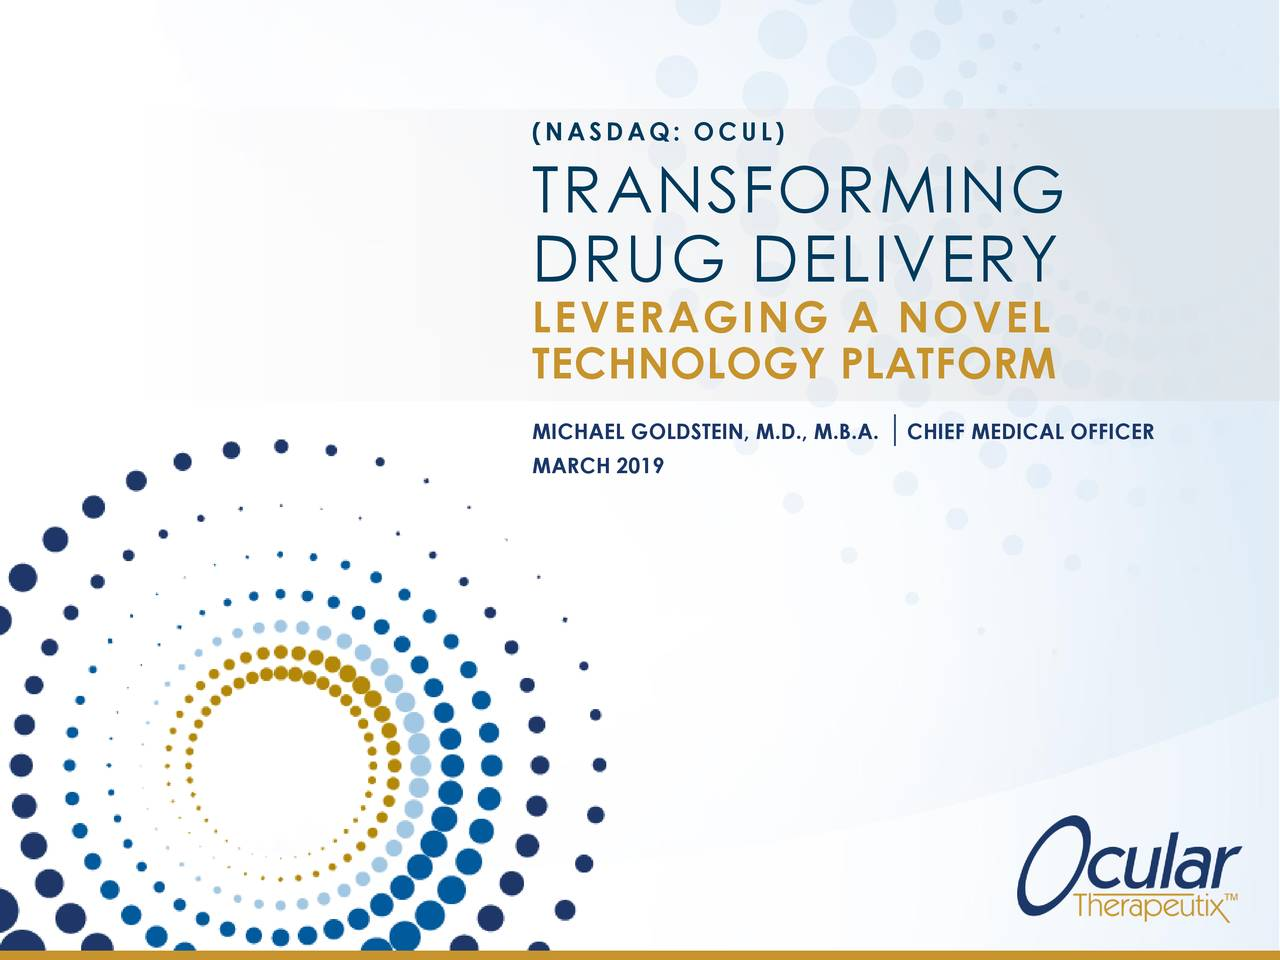 TRANSFORMING DRUG DELIVERY LEVERAGING A NOVEL TECHNOLOGY PLATFORM MICHAEL GOLDSTEICHIEF MEDICAL OFFICER MARCH 2019